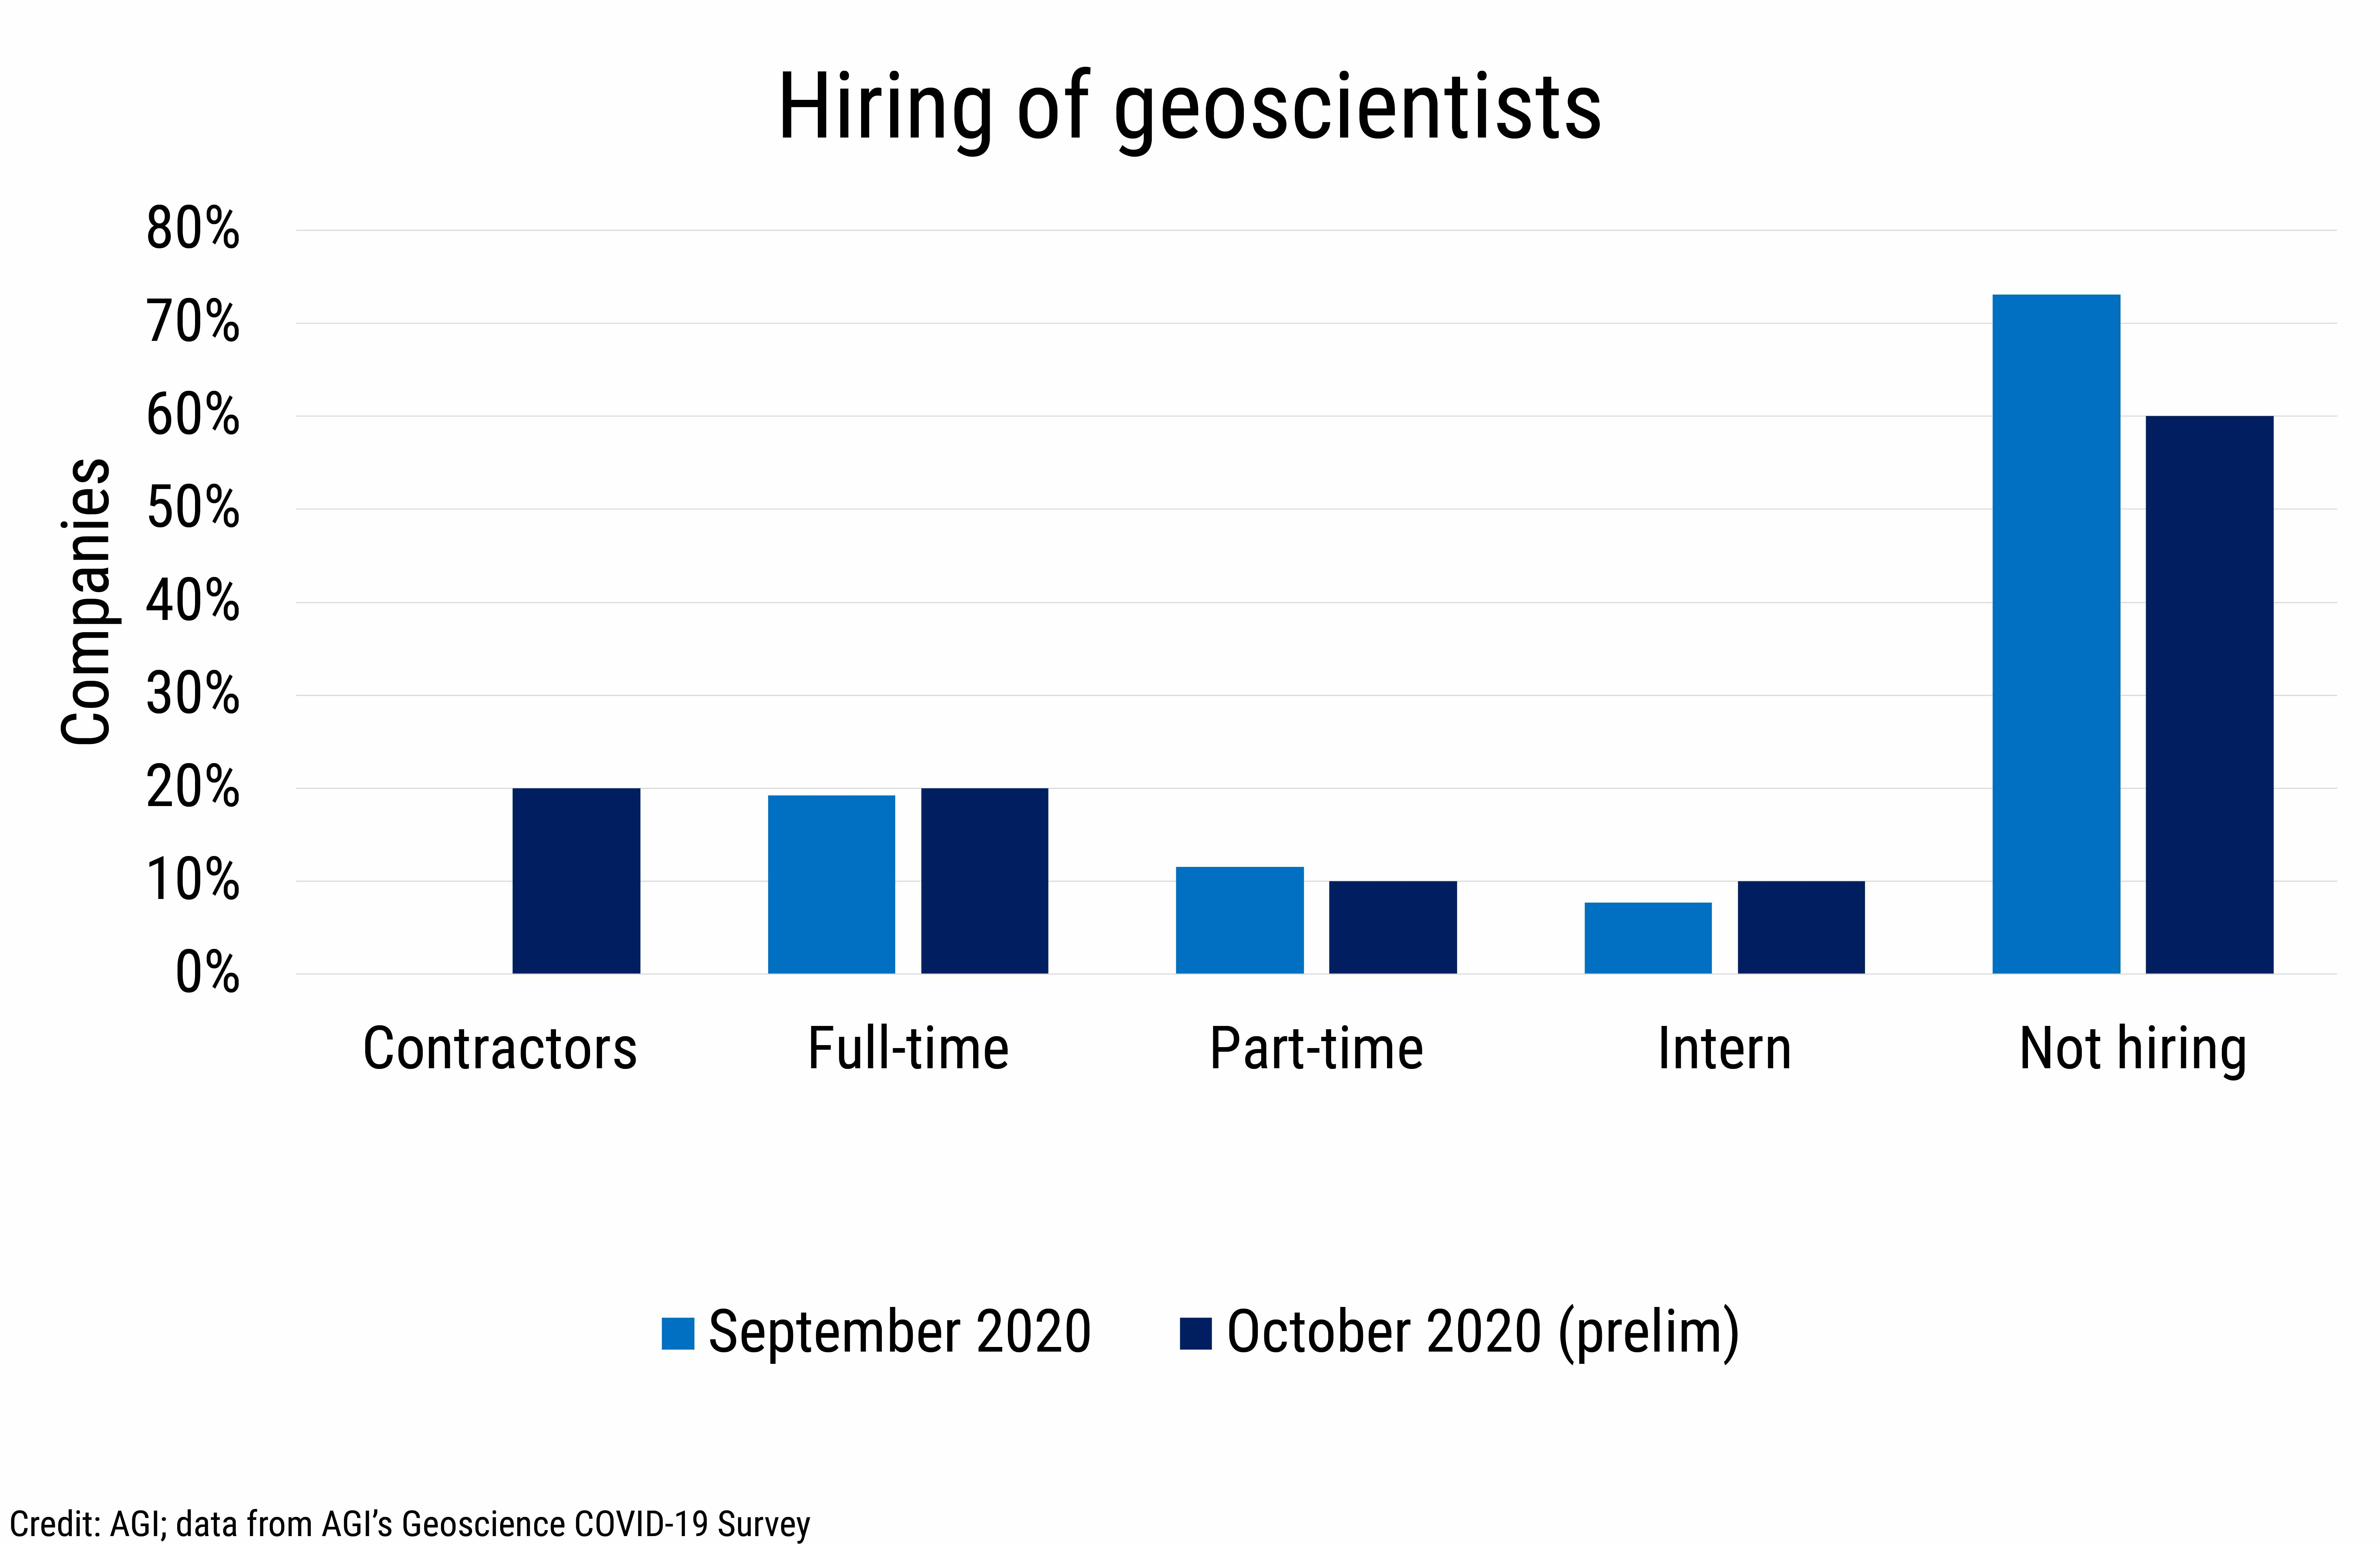 DB_2020-027 chart 08:  Hiring of geoscientists (Credit: AGI; data from AGI's Geoscience COVID-19 Survey)